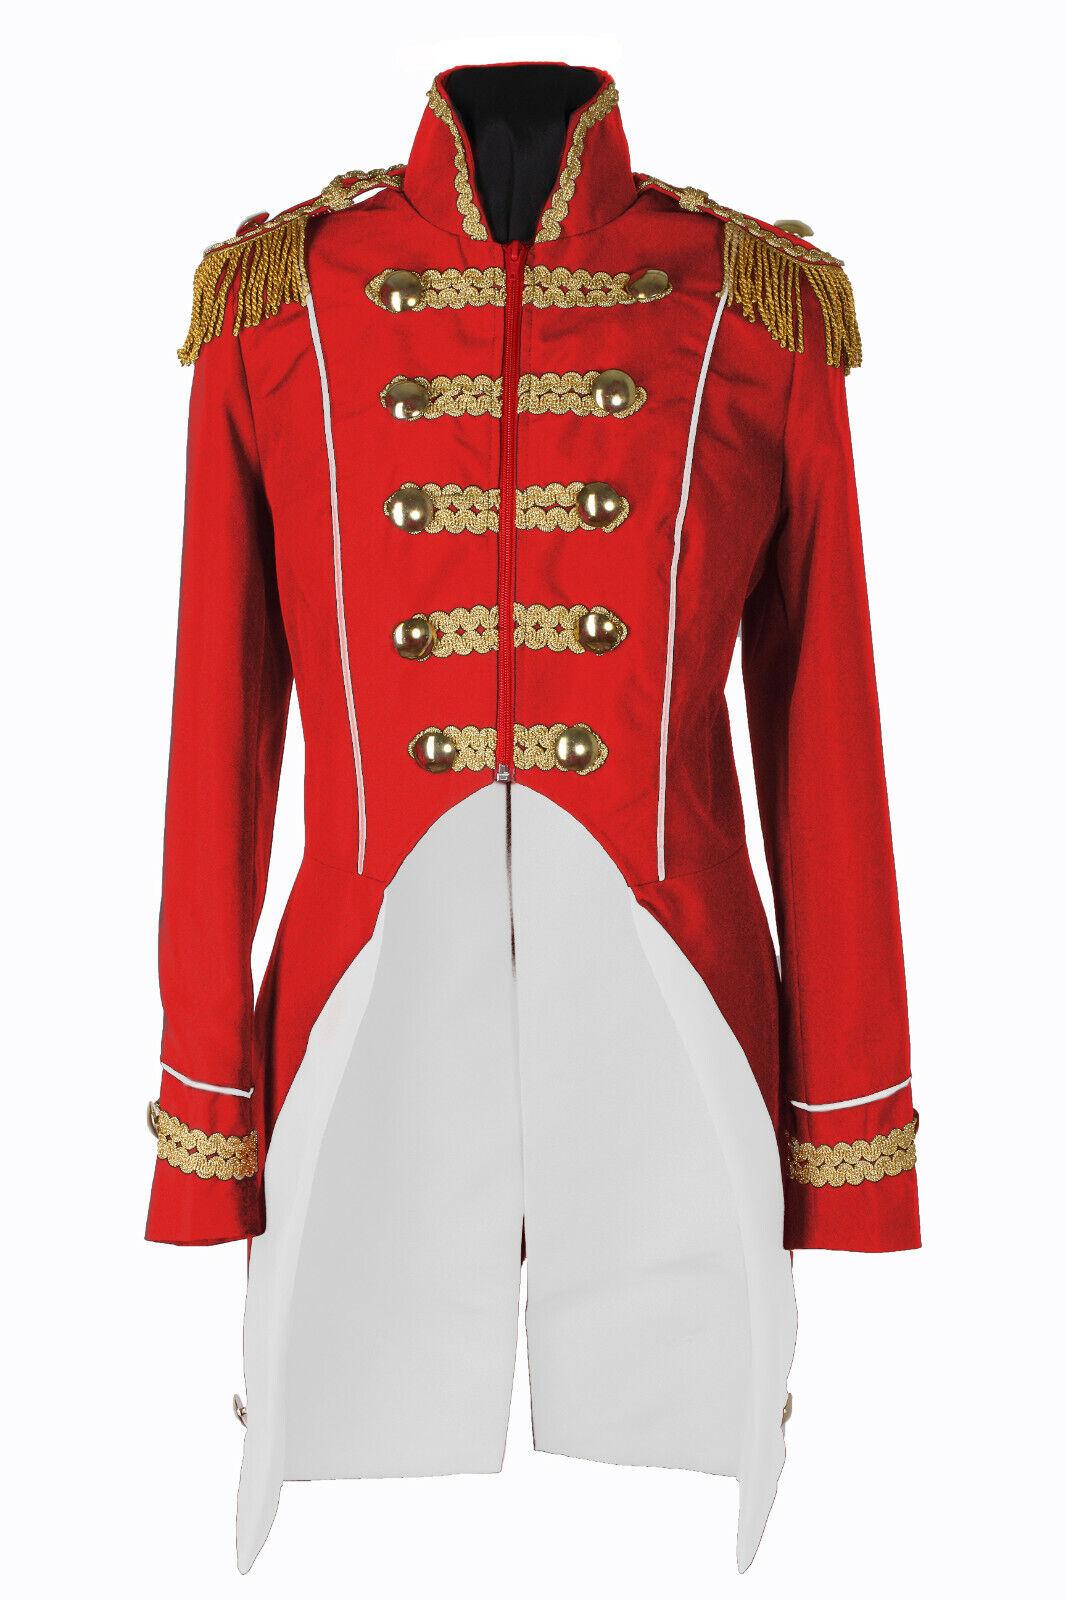 Karnevalskostüm Soldat Damen Jacke Uniform Fasching Gehrock Köln 36-54